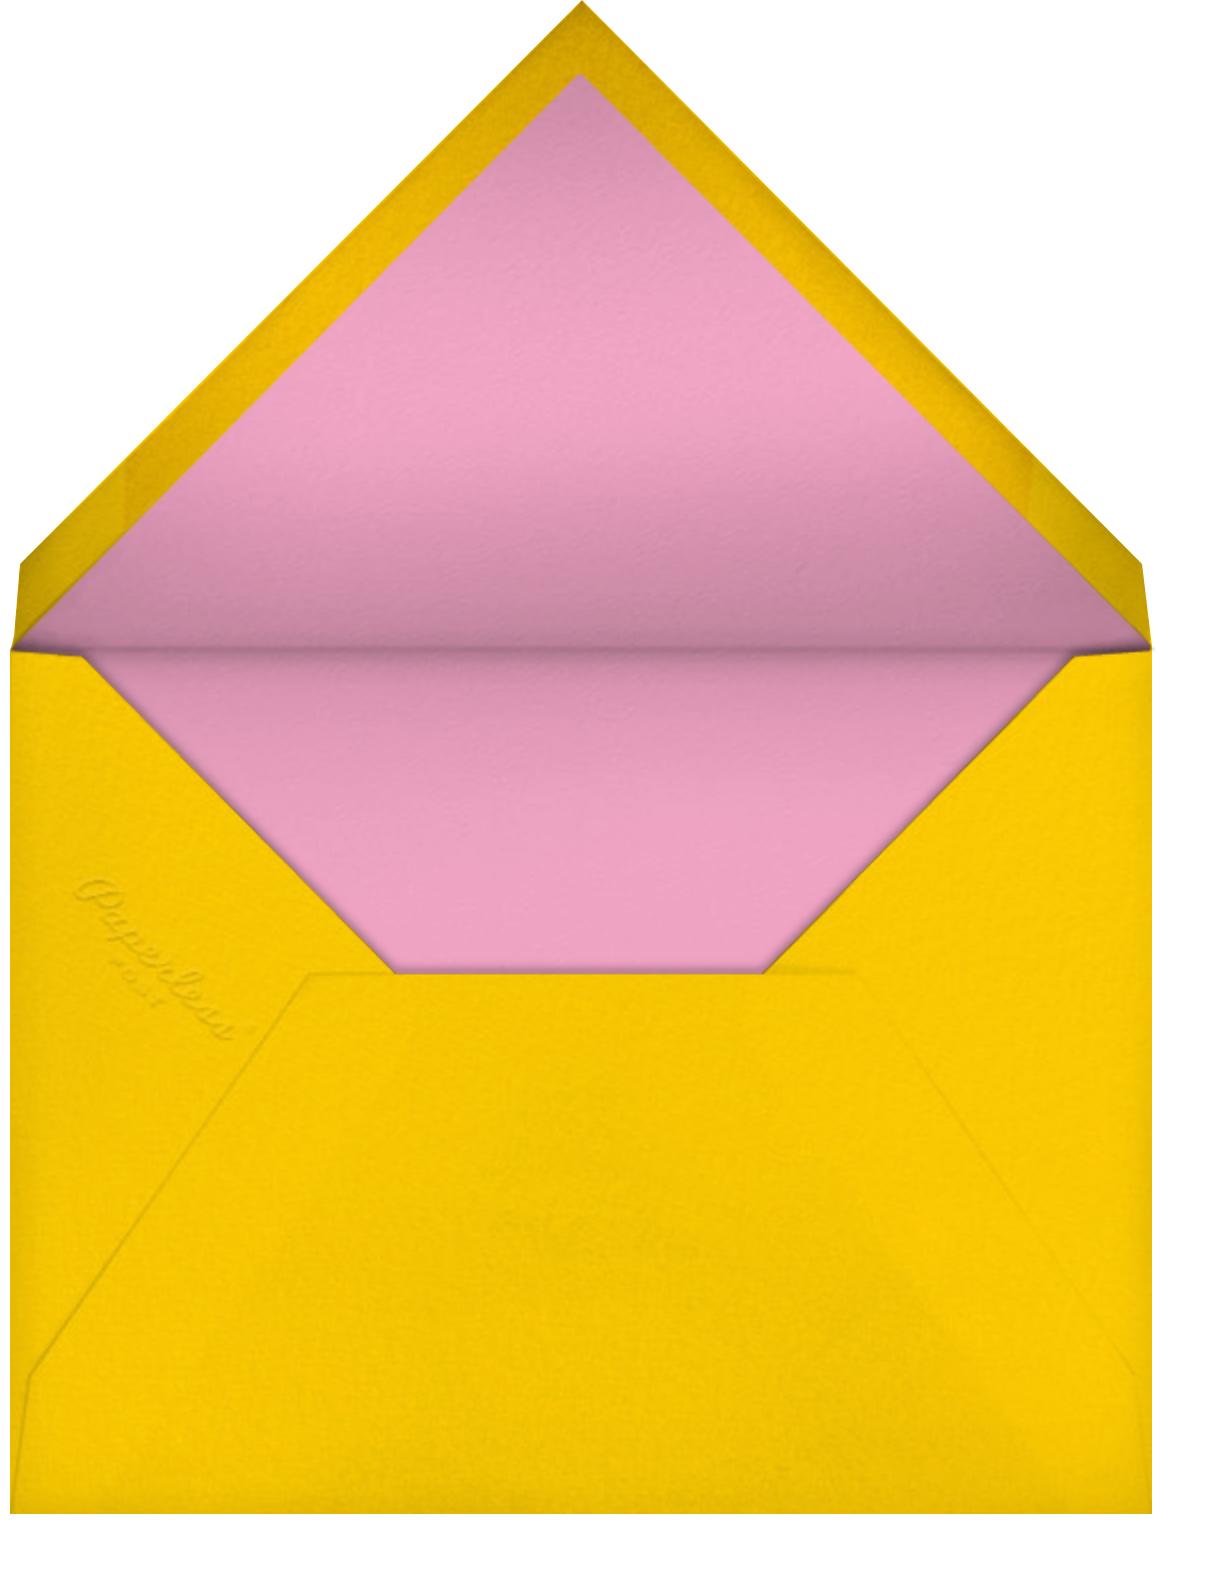 Poodle for Christmas (Bodil Jane) - Red Cap Cards - Christmas - envelope back